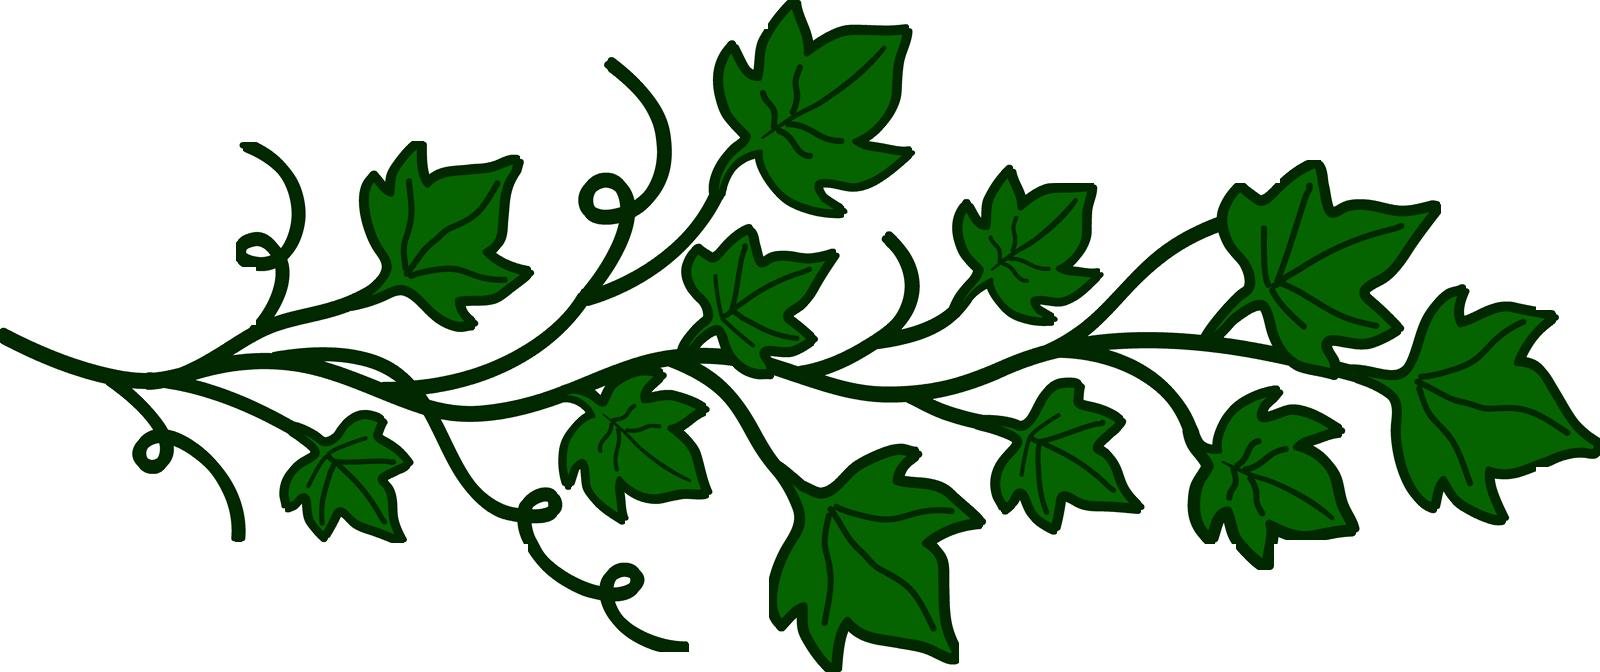 Free Vine Cliparts Transparent, Download Free Clip Art, Free.